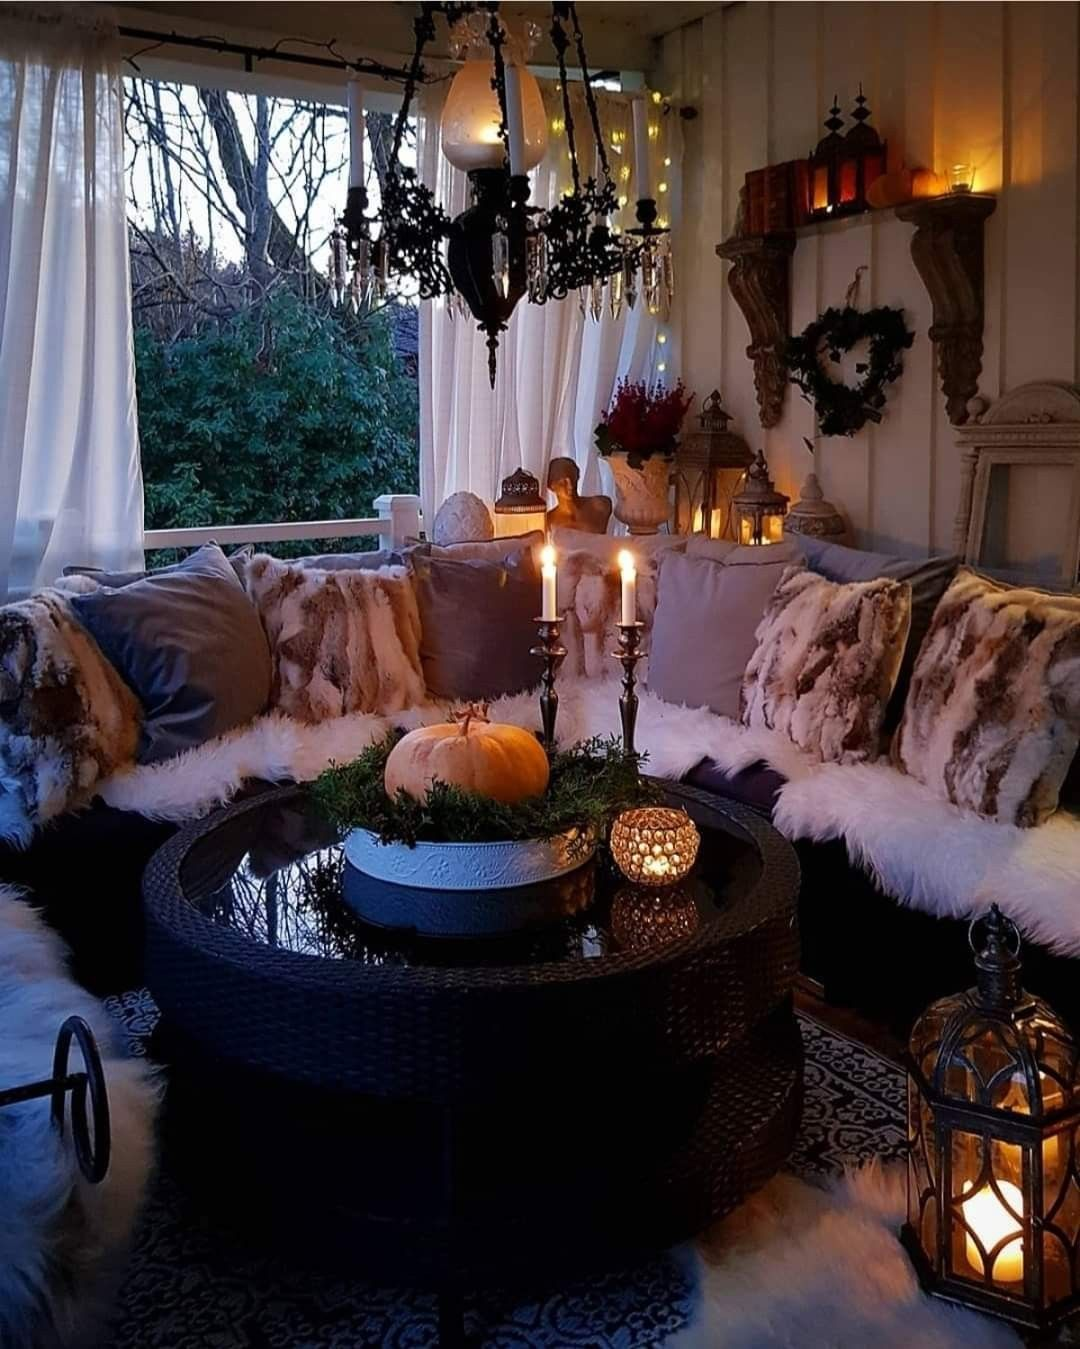 Falloween decor in 2020 Halloween room decor, Cozy house